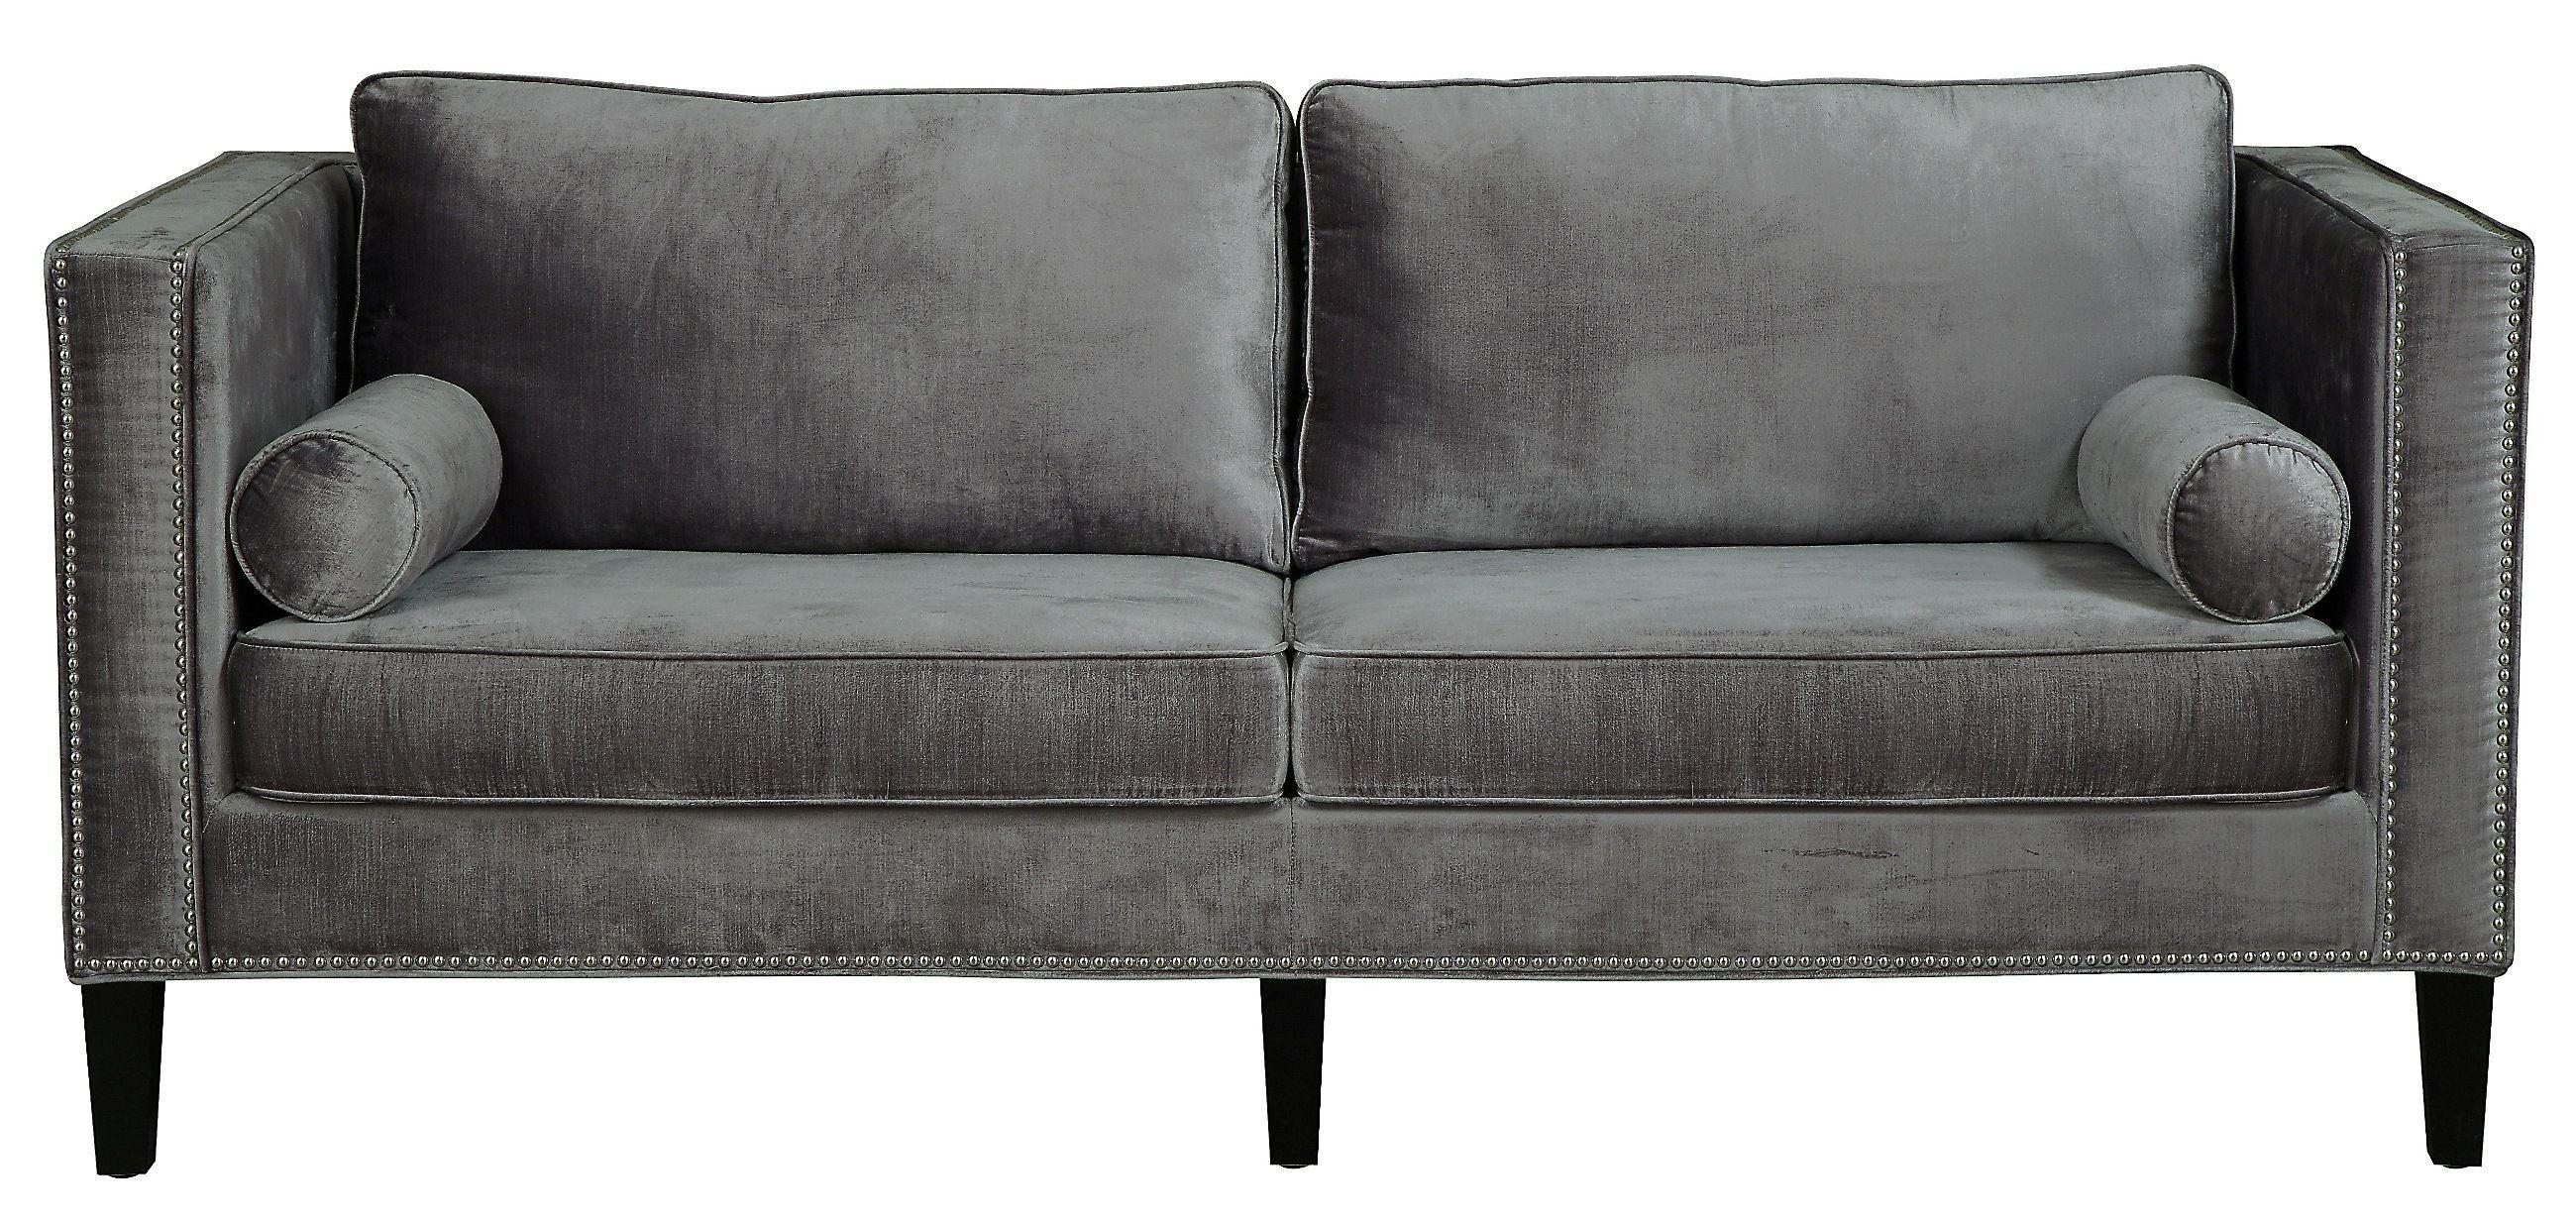 velvet sleeper blue sofa medium couch sale for bed teal of size corner